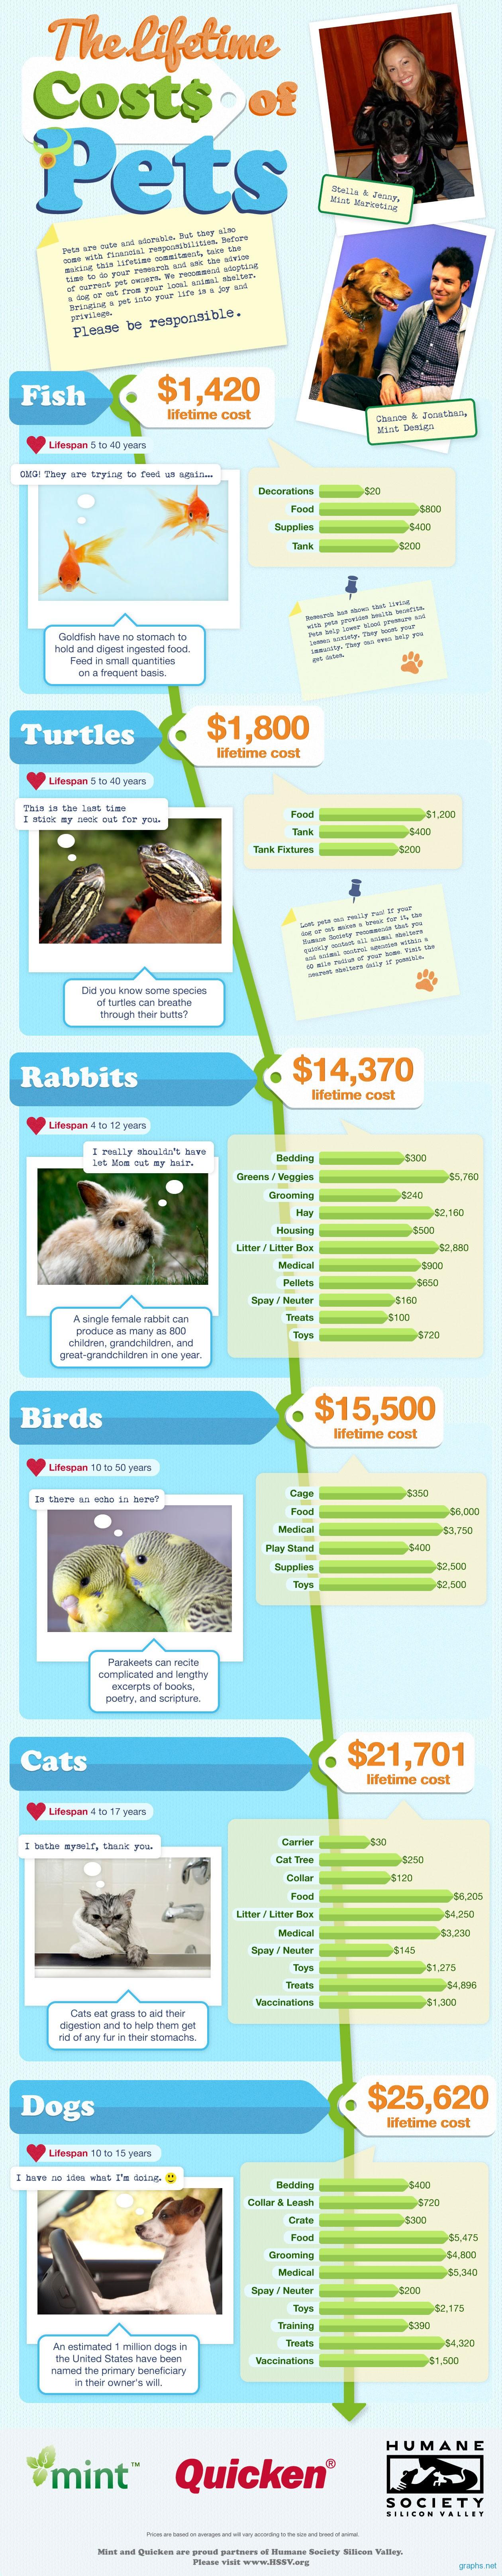 Cost Of Neutering Your Dog Niagara Falls Humane Socieity